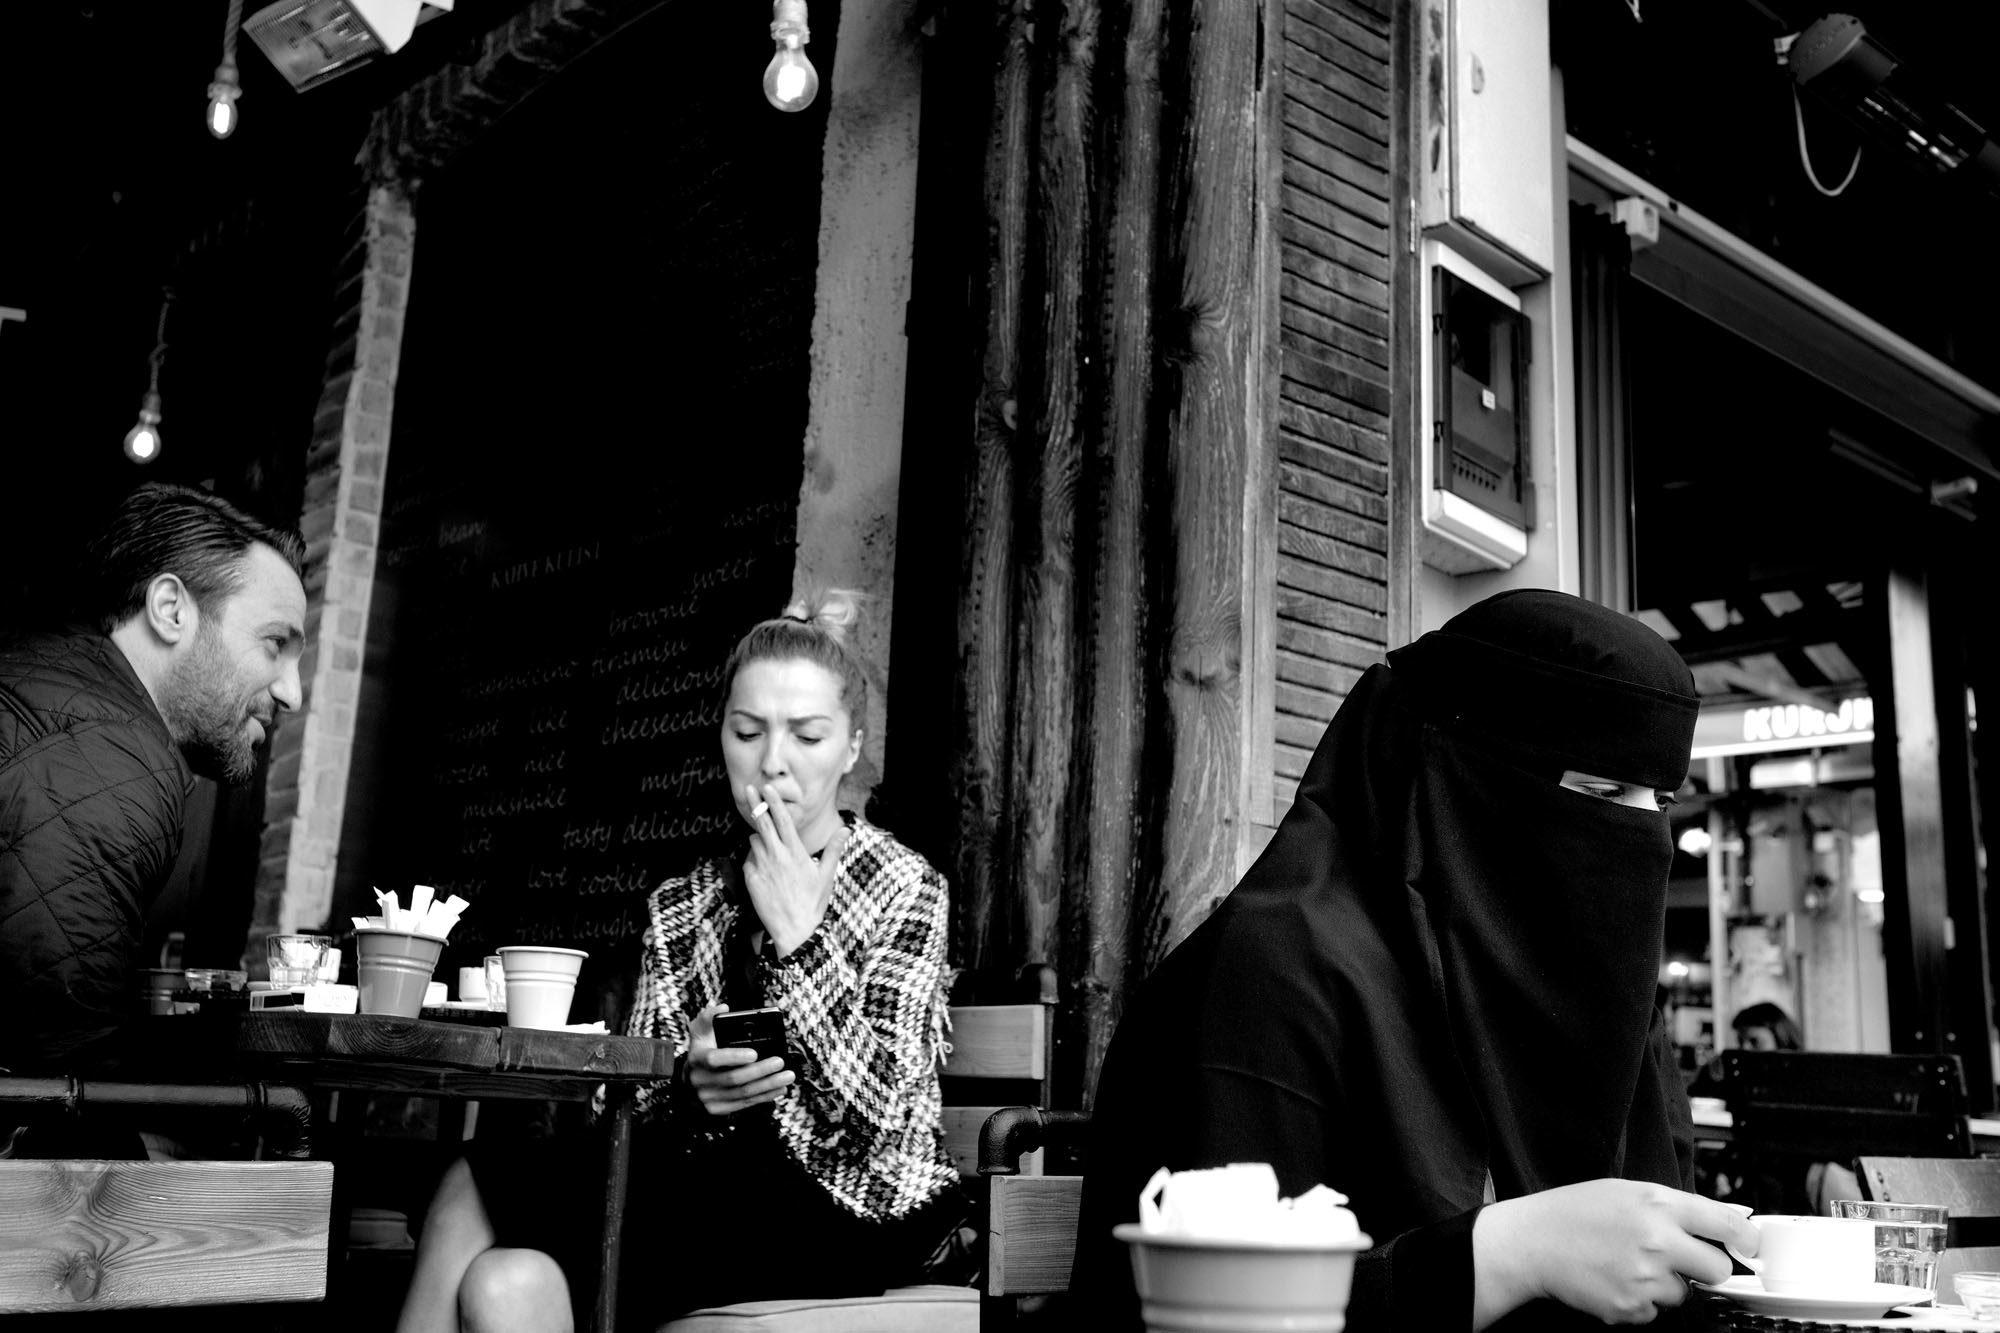 A café in Kadıköy. Photo: Magnus Sundberg / Kontinent